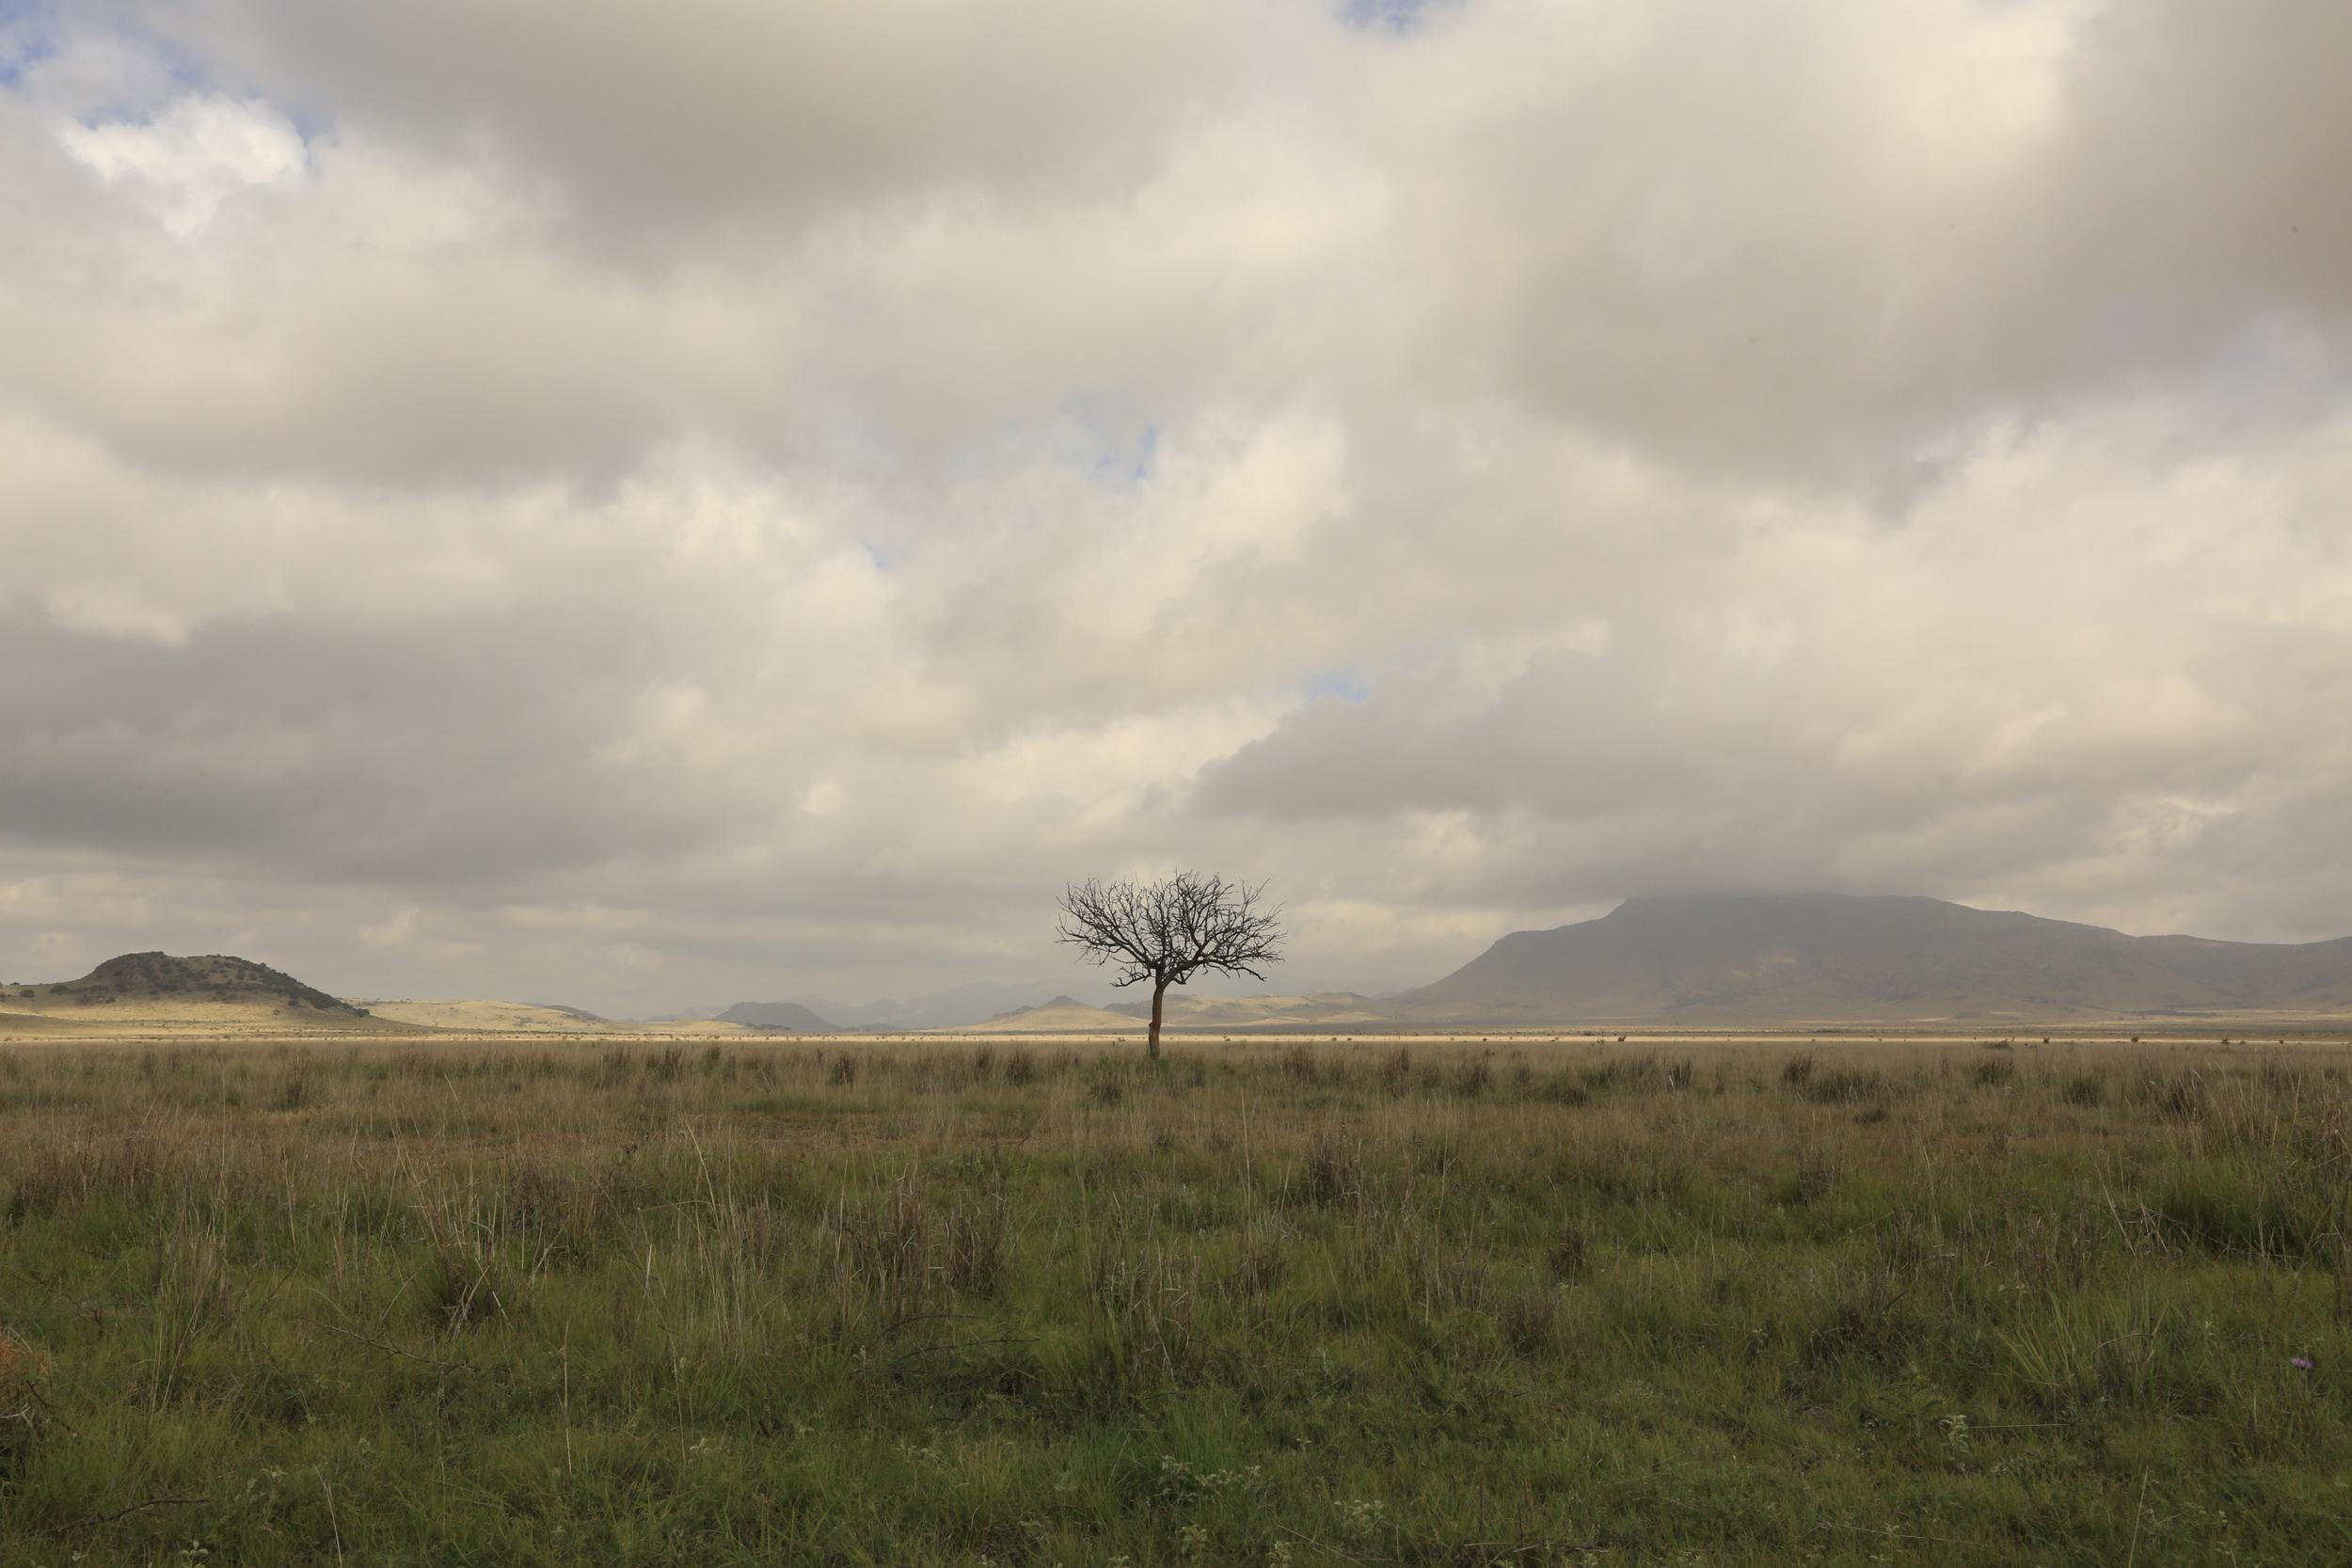 Lone tree on the way to Marfa